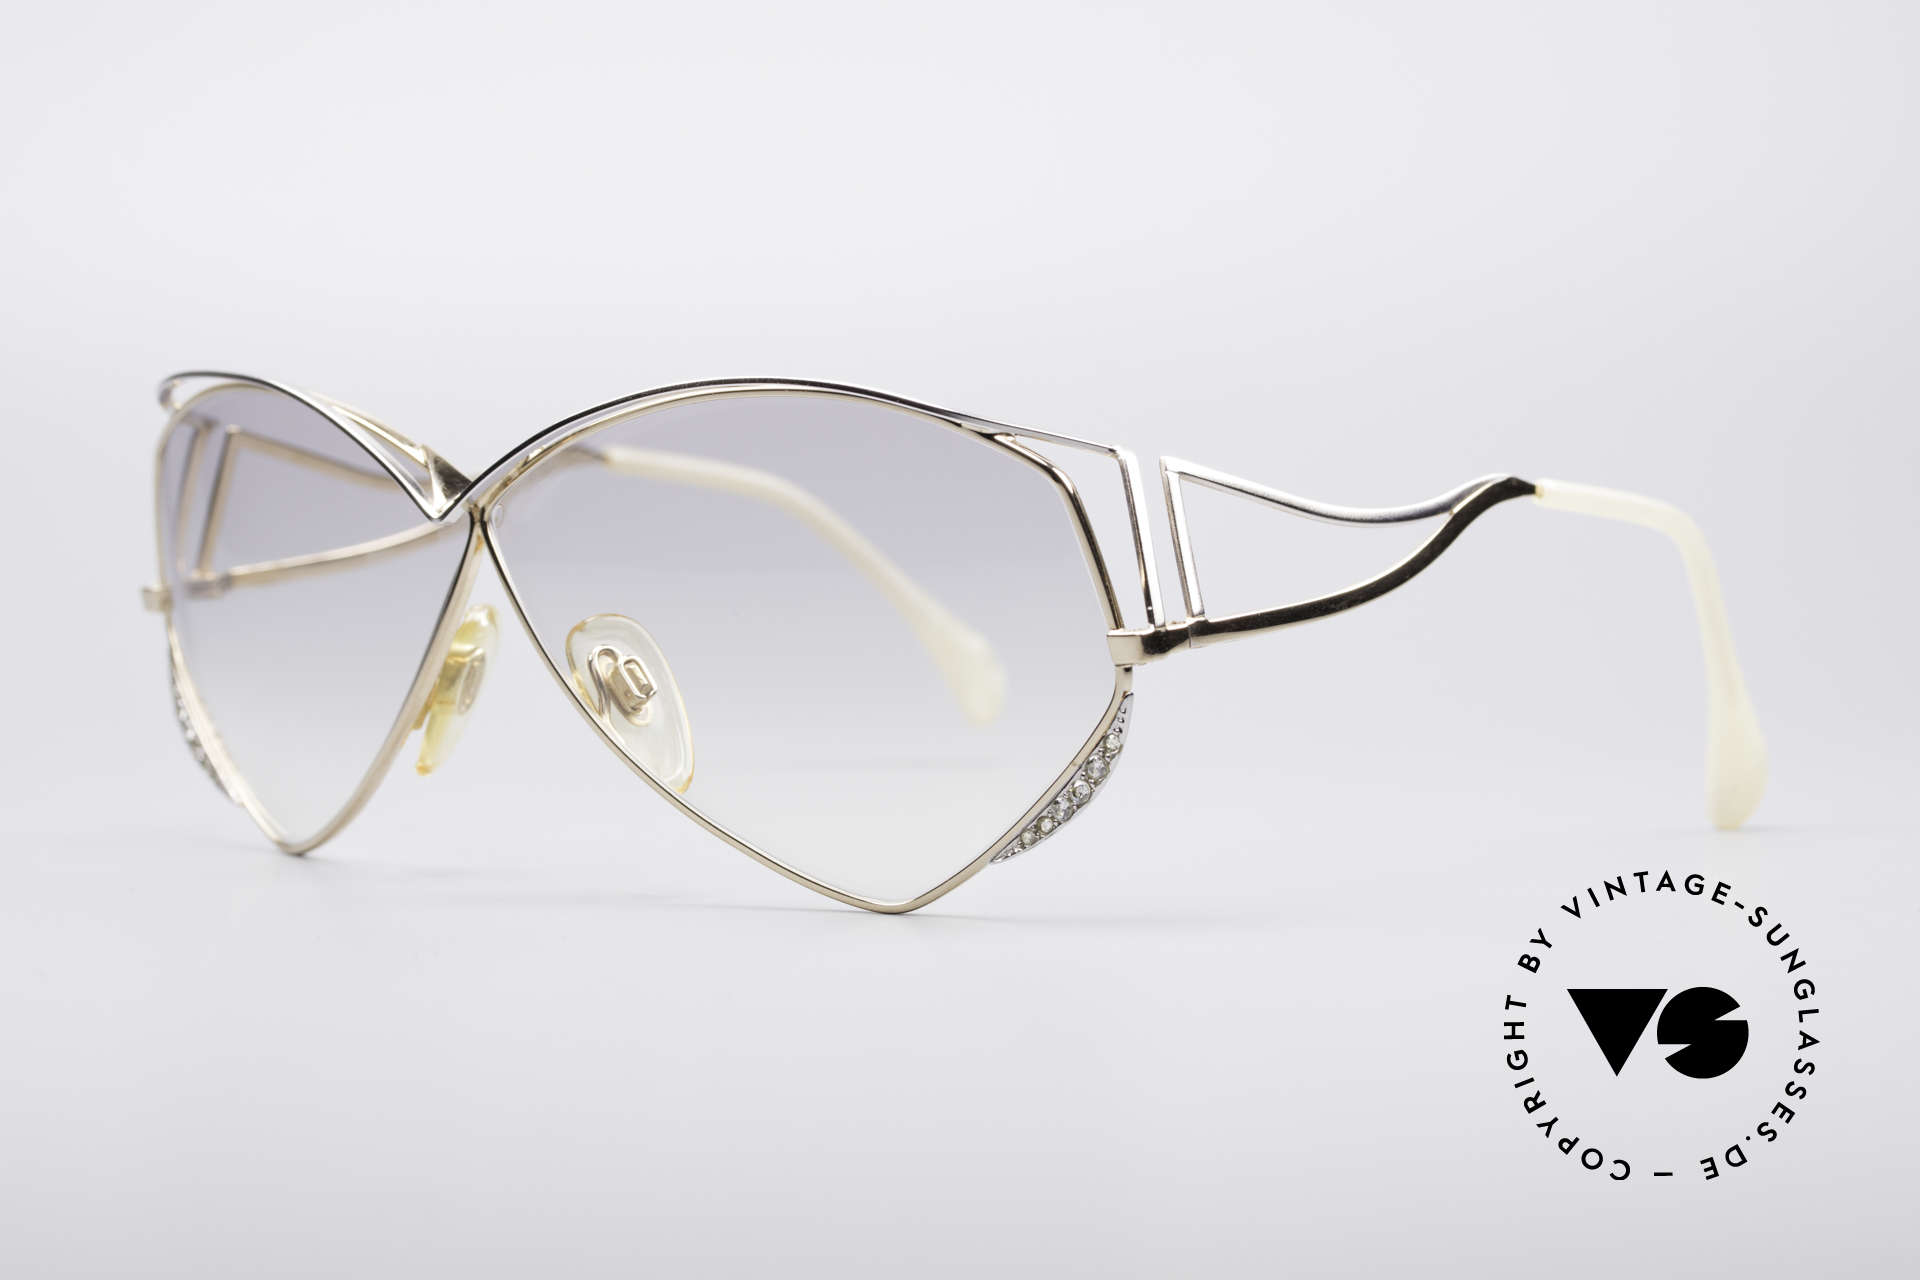 Zollitsch Navette Princess Sunglasses, a true eye-catcher with light gray tinted sun lenses, Made for Women